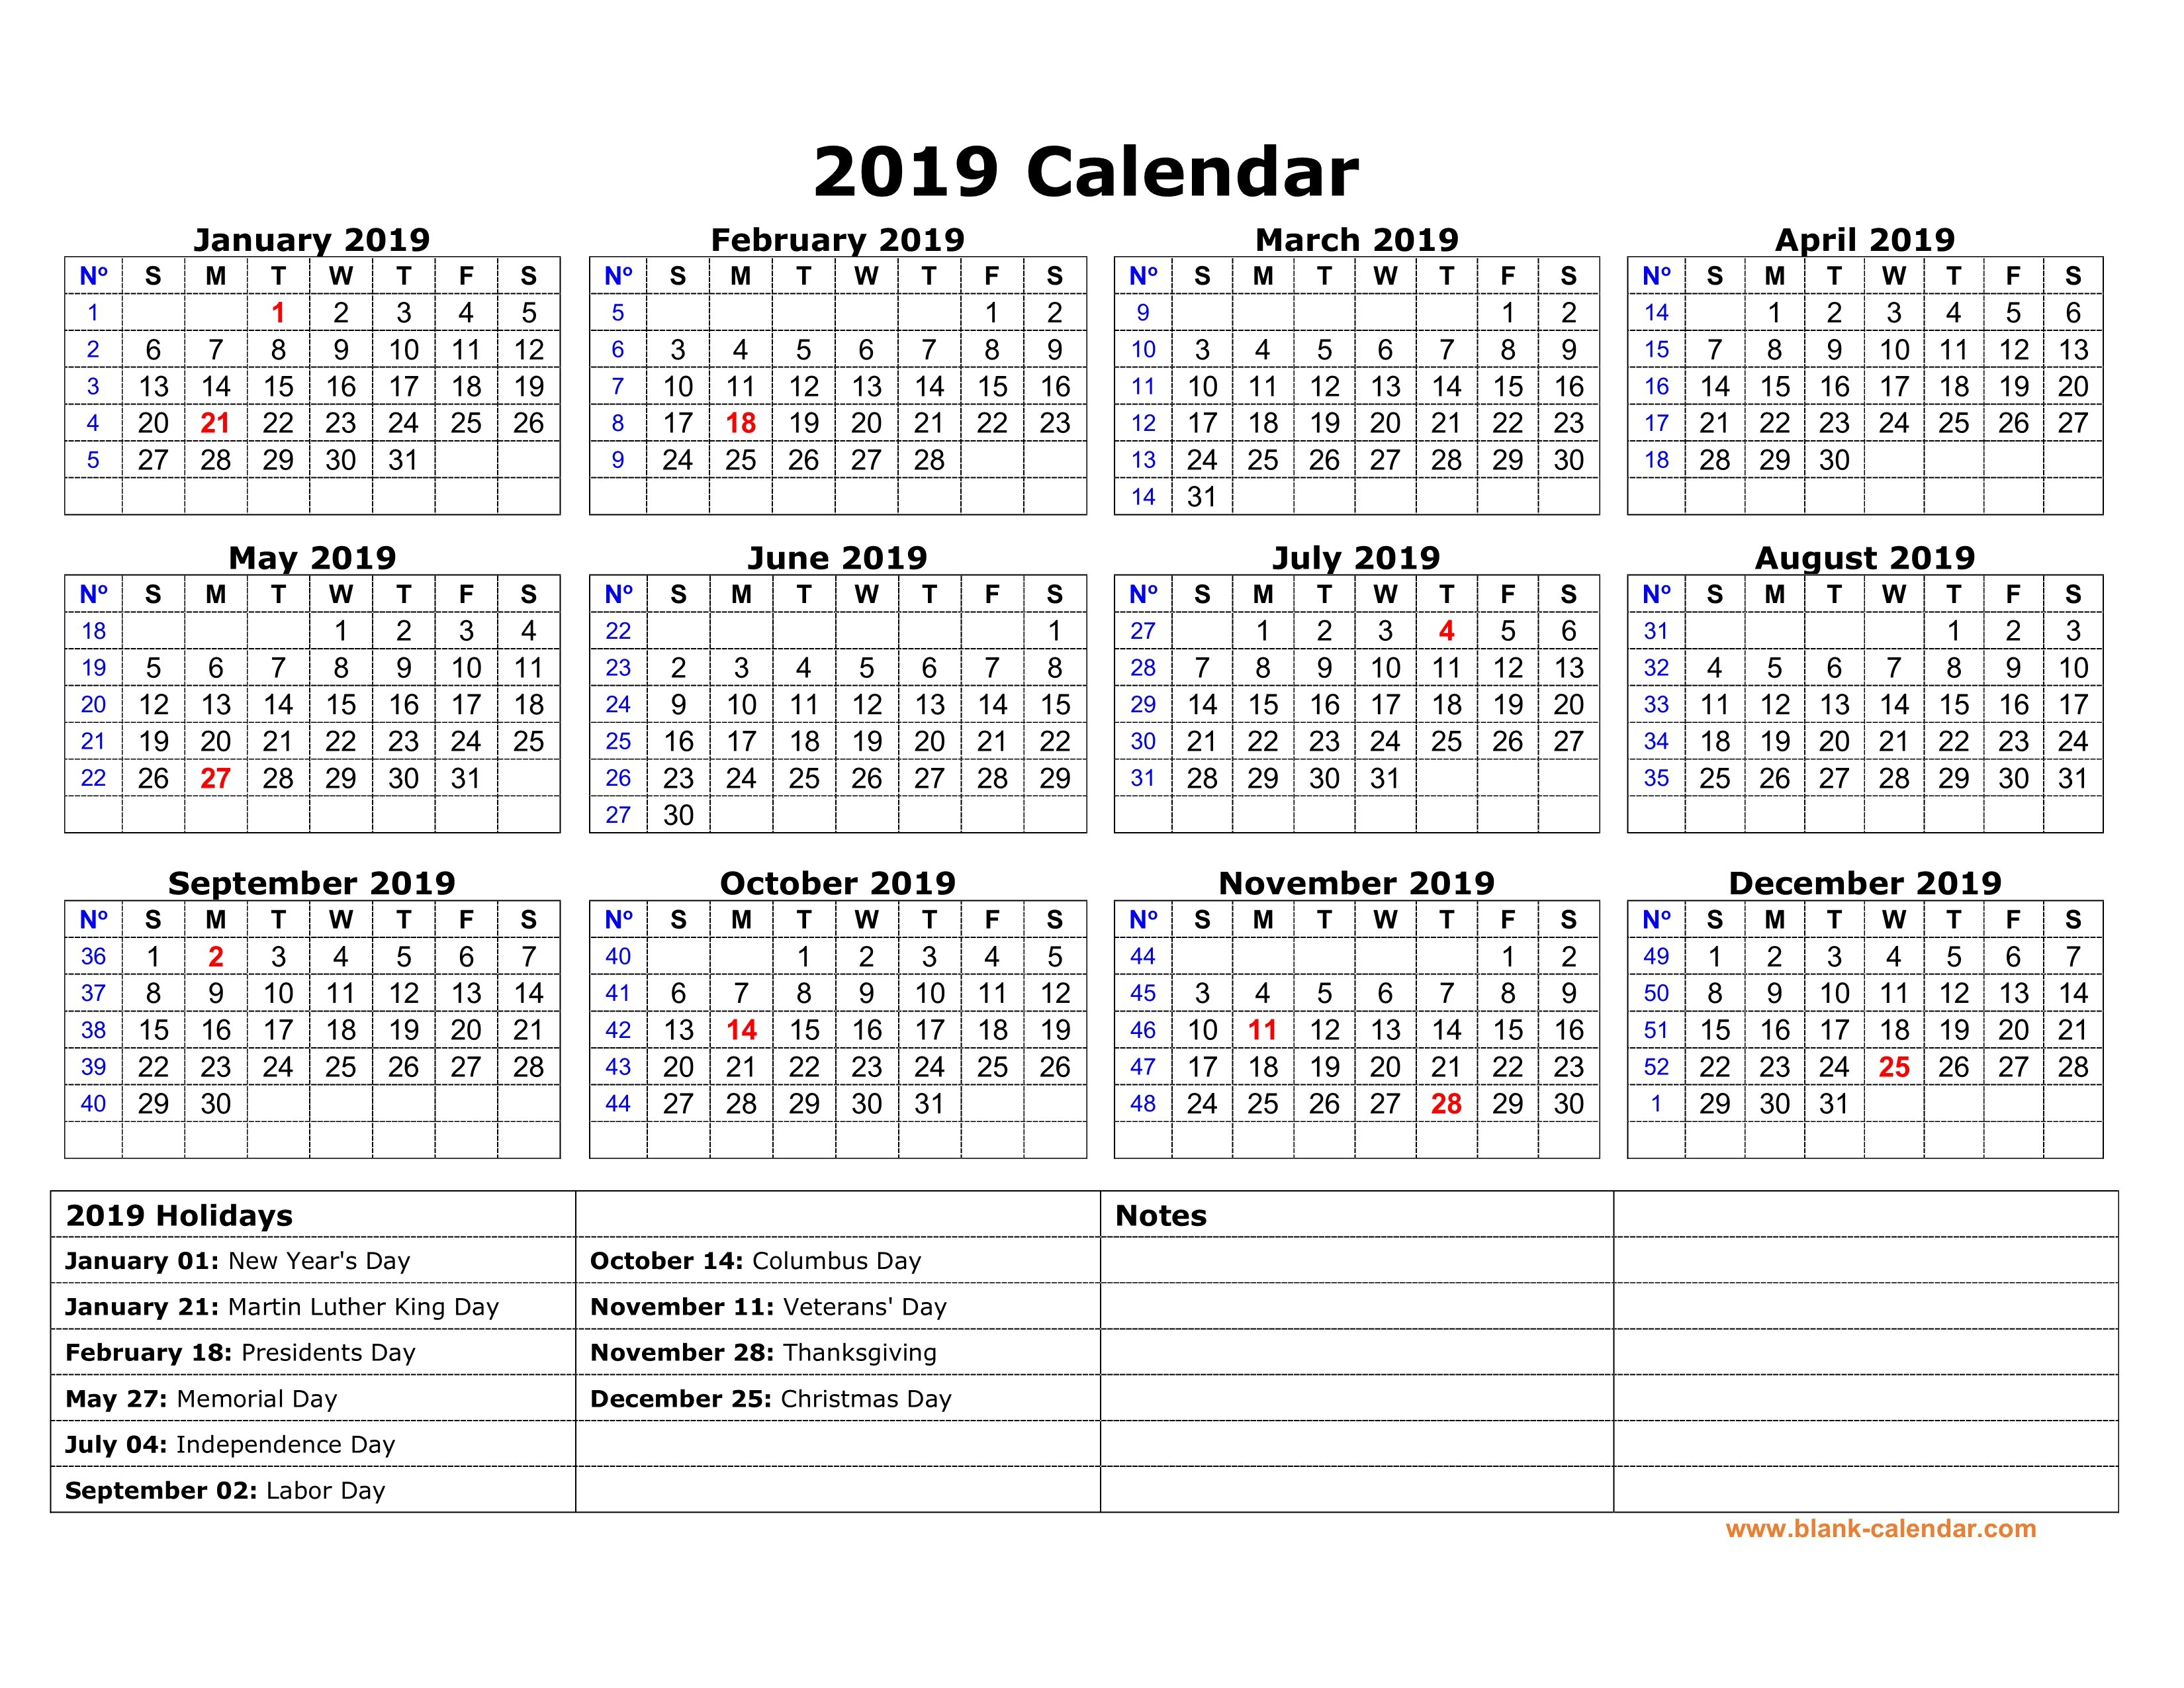 Free Download Printable Calendar 2019 With Us Federal Holidays, One Calendar 2019 Calendar